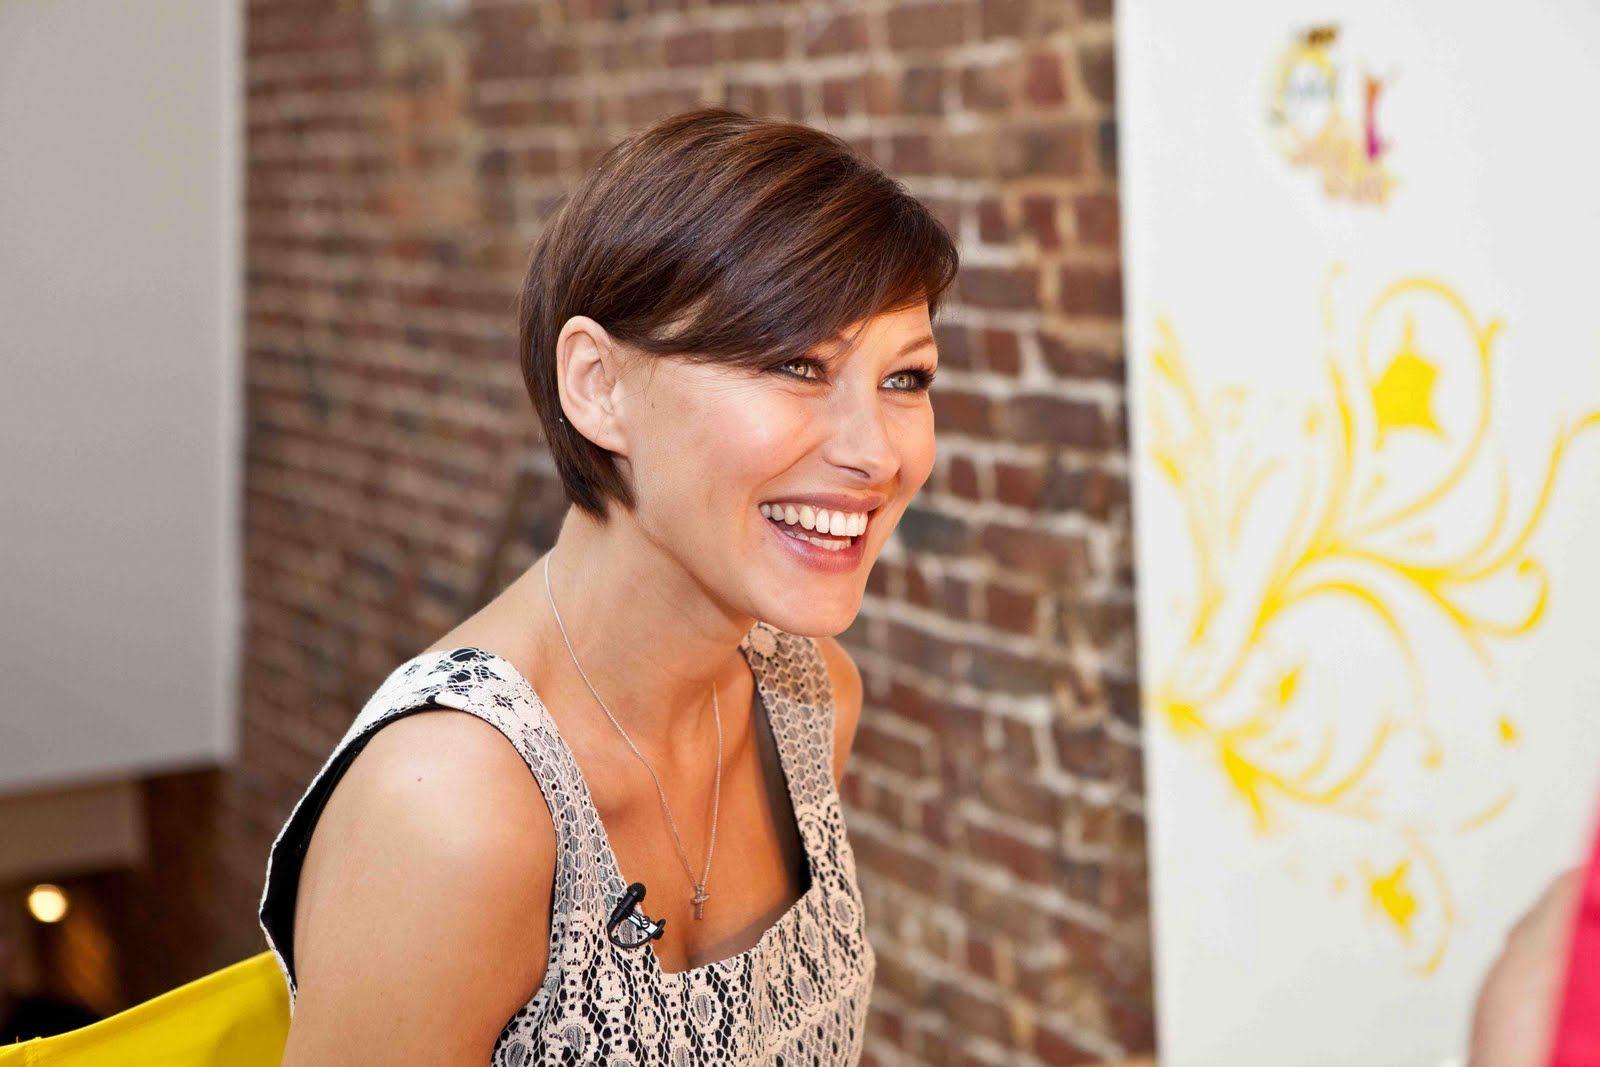 Lorenslittlelovelys Bic Soleil Razors Review Emma Willis Hair Short Hair Styles Emma Willis